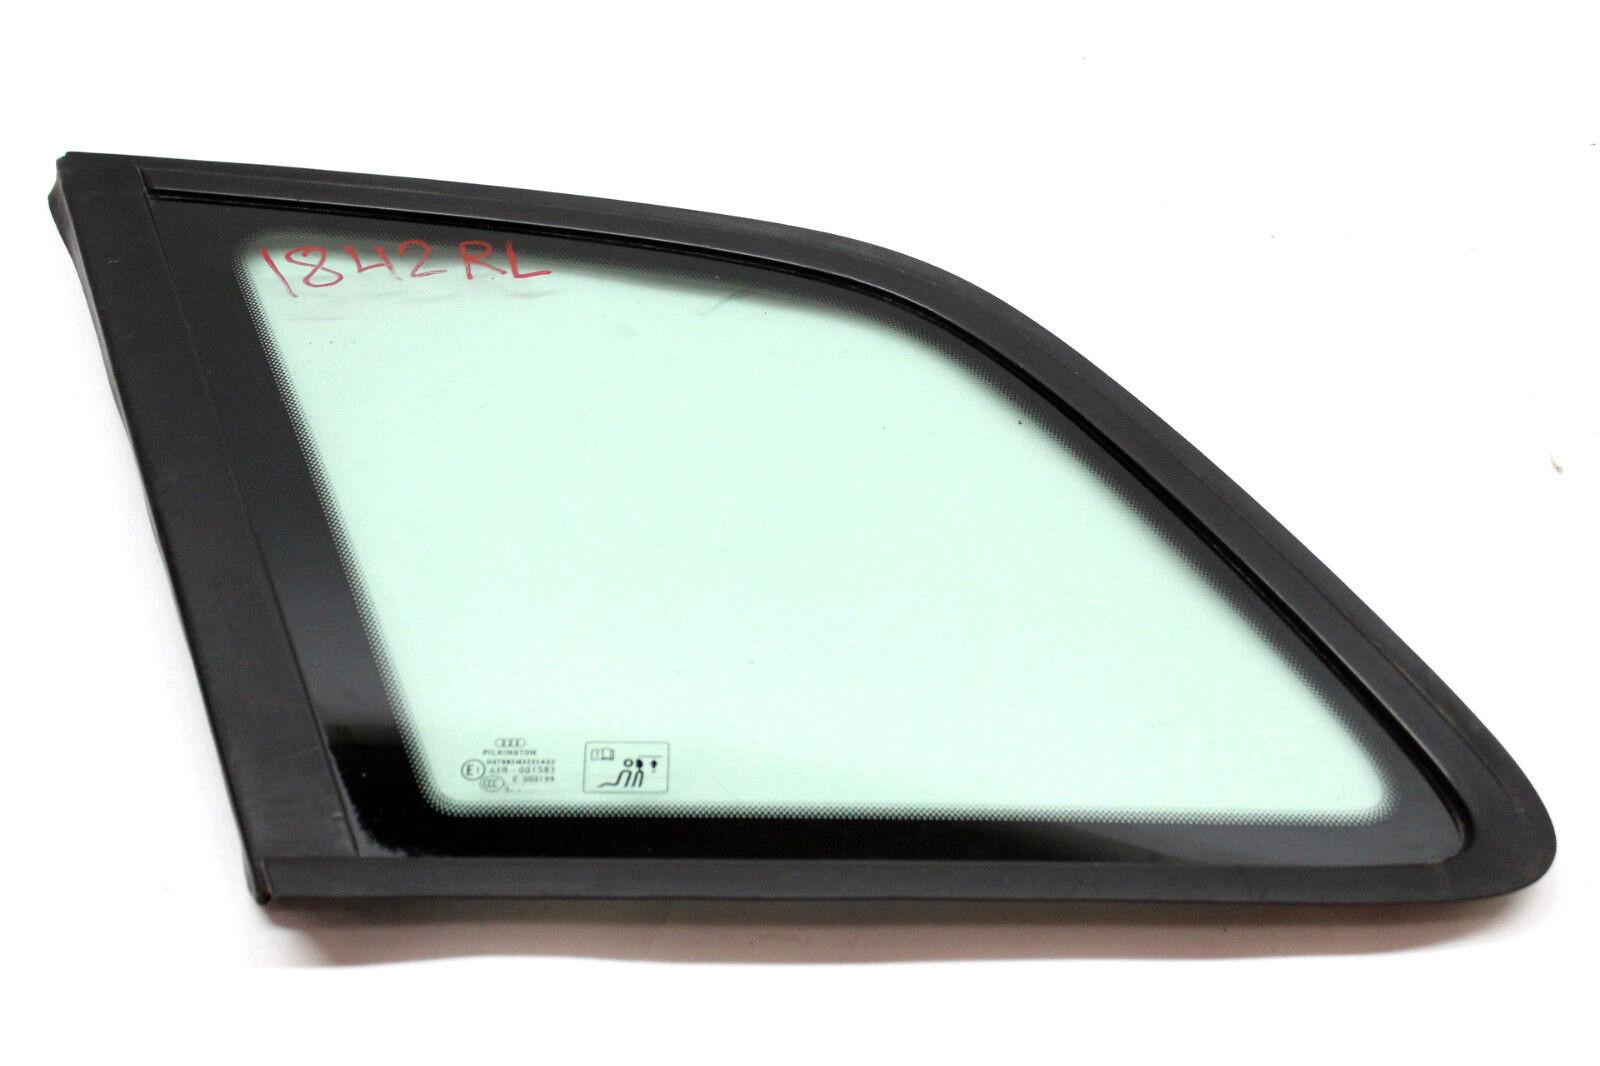 Audi 2011-2013 A3 Wagon Rear Left Door Window Glass OEM 8p4845299c